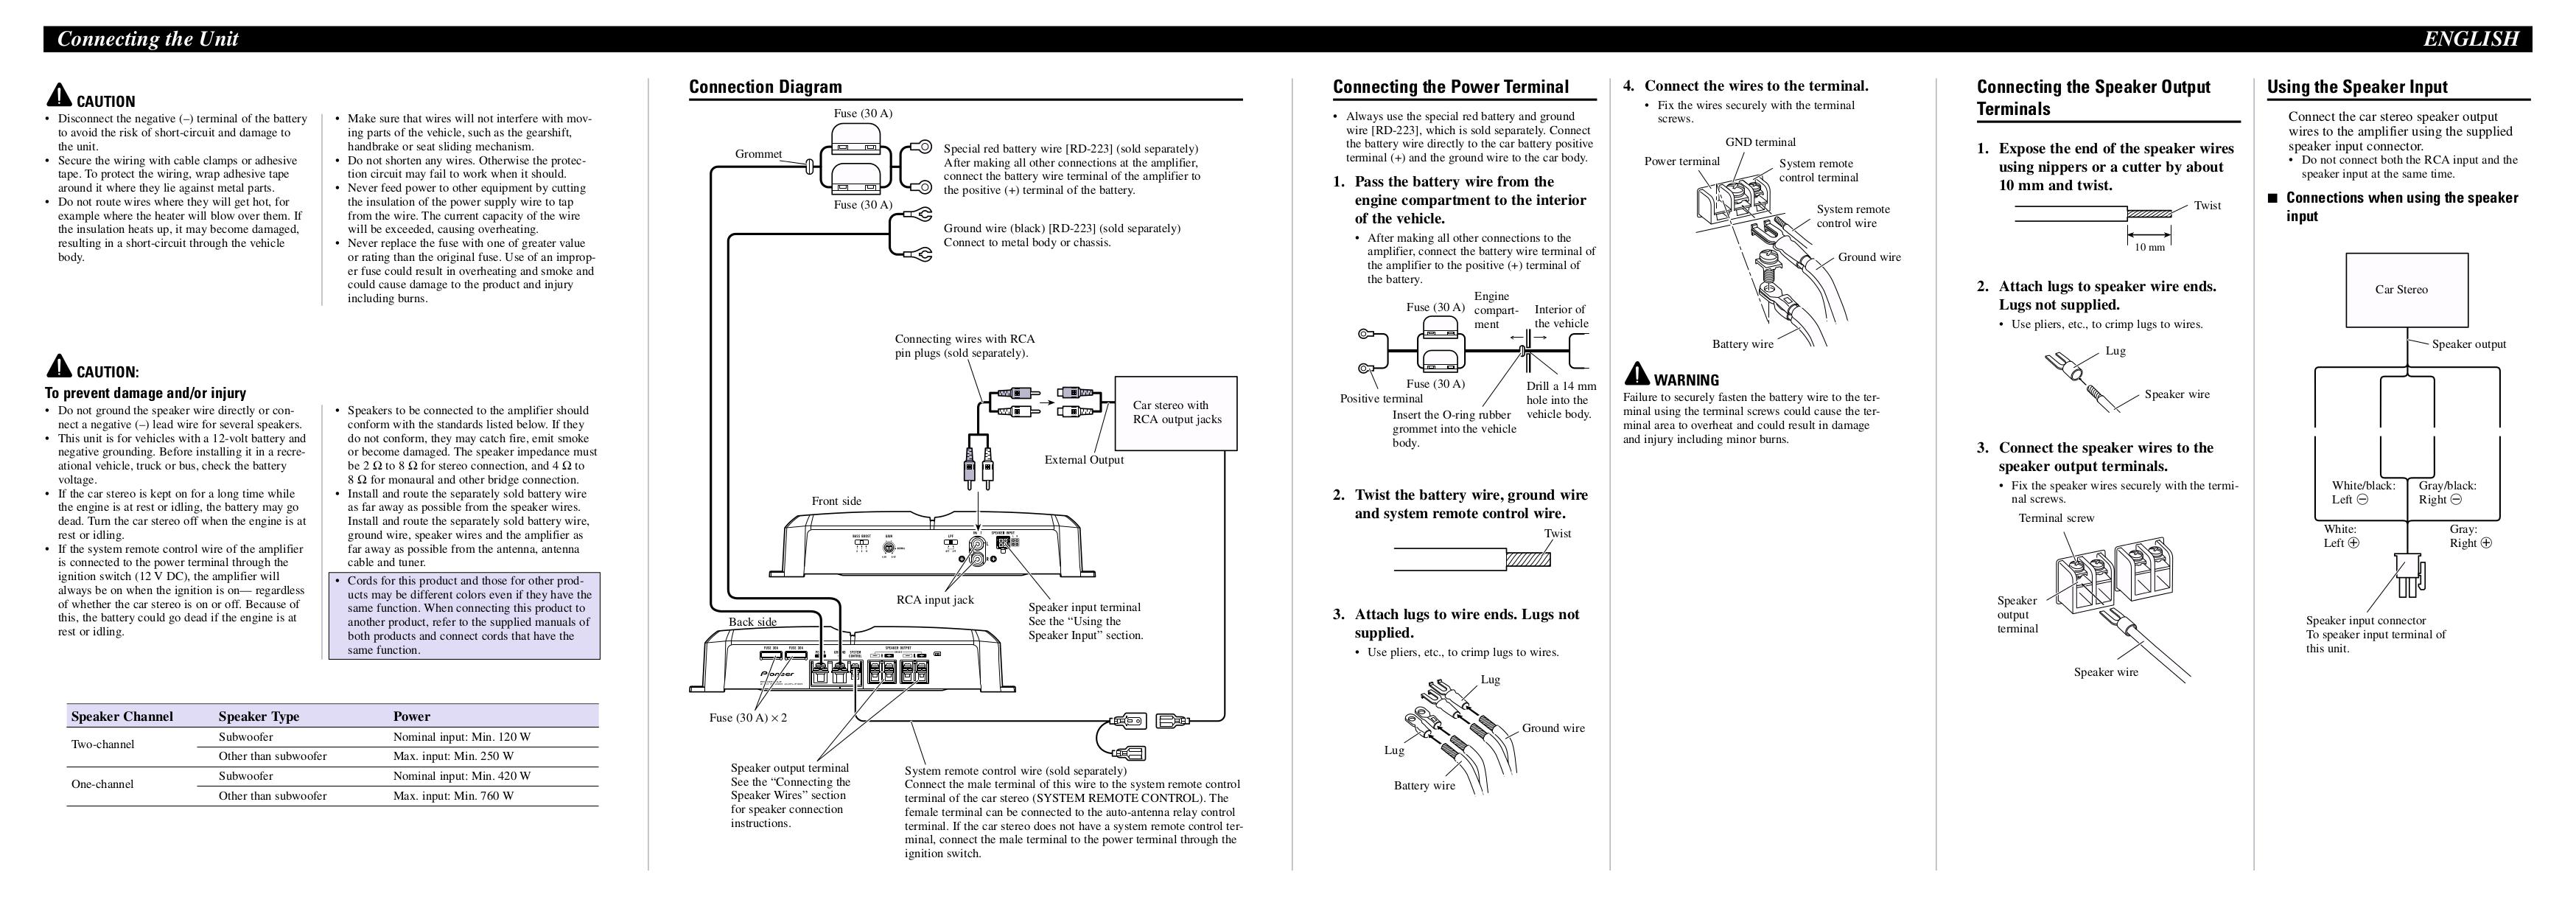 Pioneer Gm X404 Wiring Diagram - Trusted Wiring Diagrams on pioneer radio wiring colors, car amp installation diagram, alpine radio wiring diagram, car cd player wiring diagram, pioneer radio wiring harness schematics, speakers wiring diagram, pioneer cd player diagram, pioneer deck wire diagram, kenwood wiring diagram, pioneer 4 channel wiring schematics, stereo wiring diagram, kenwood 600 amp diagram, sony cdx wiring diagram, pioneer radio diagram, subwoofer wiring diagram, rockford wiring diagram, amplifier wiring diagram, technics wiring diagram,